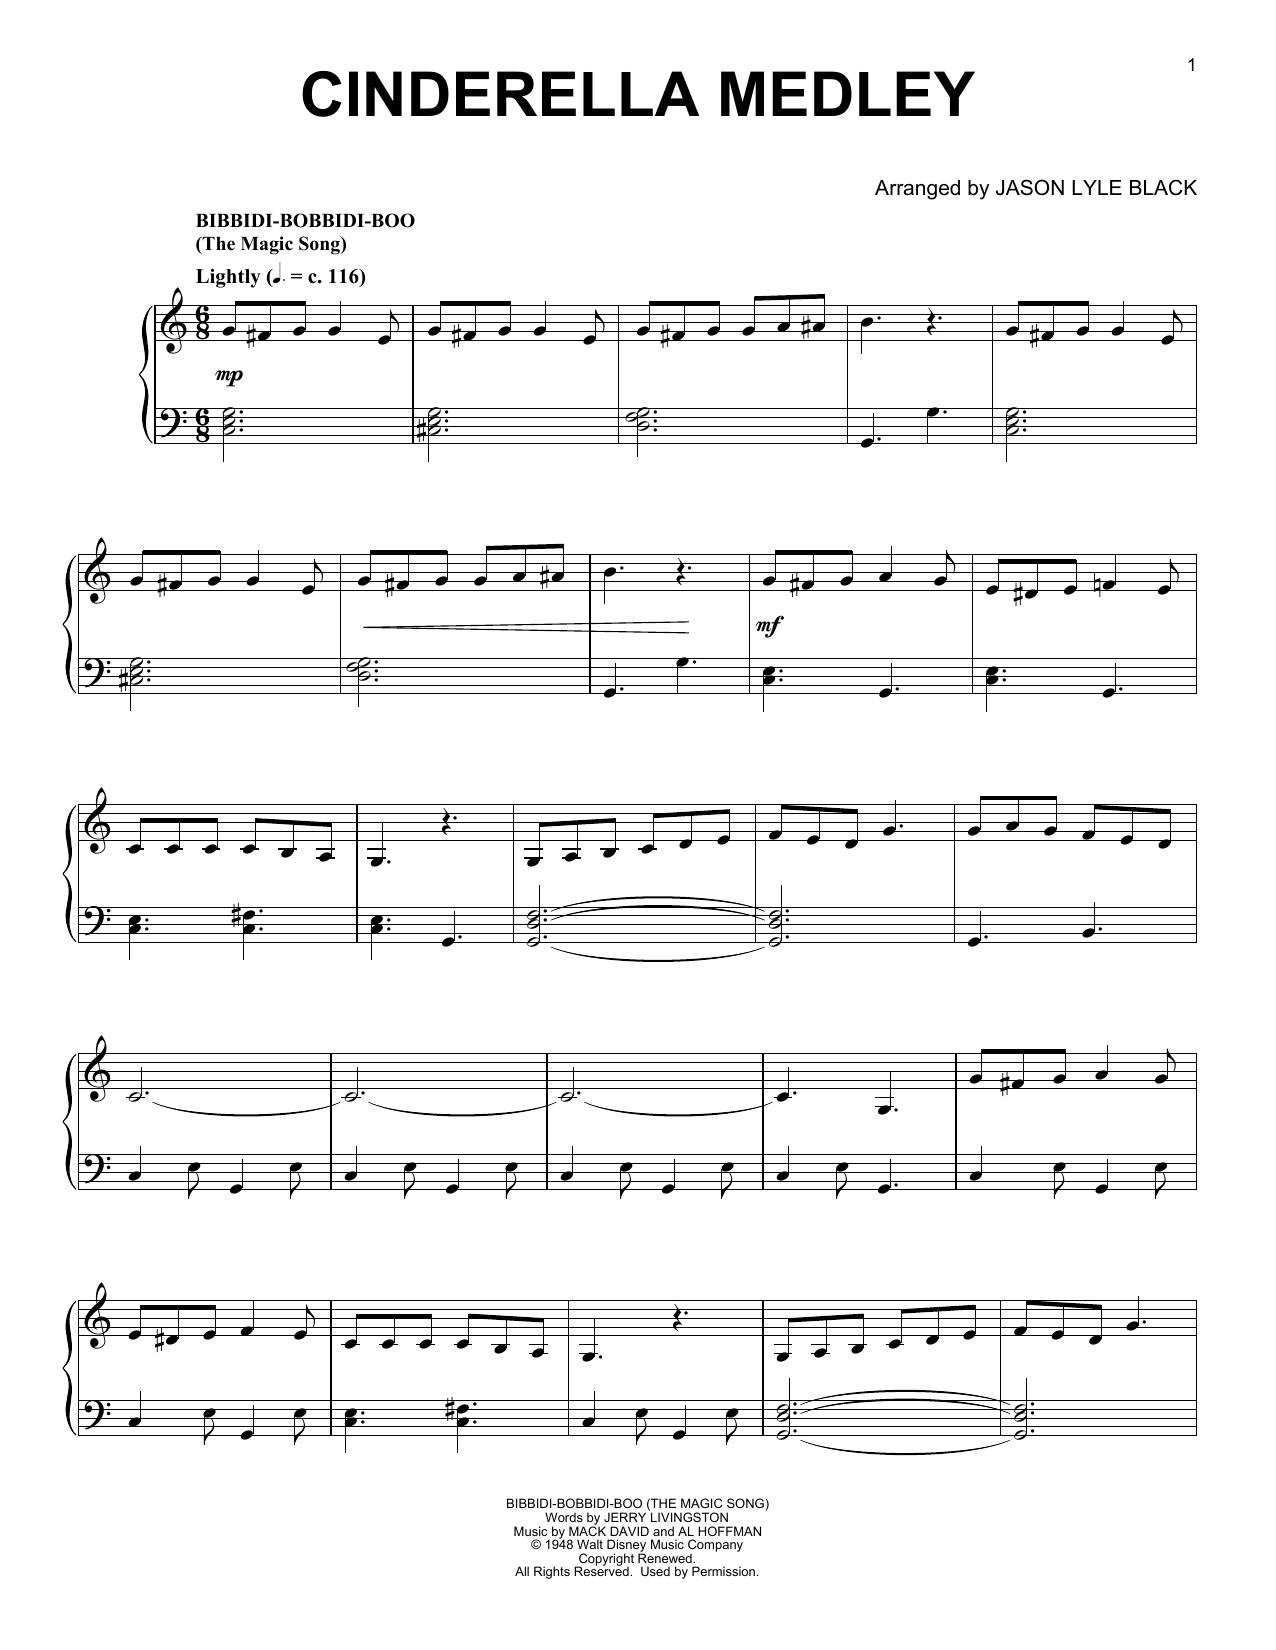 Jason Lyle Black Cinderella Medley sheet music notes and chords